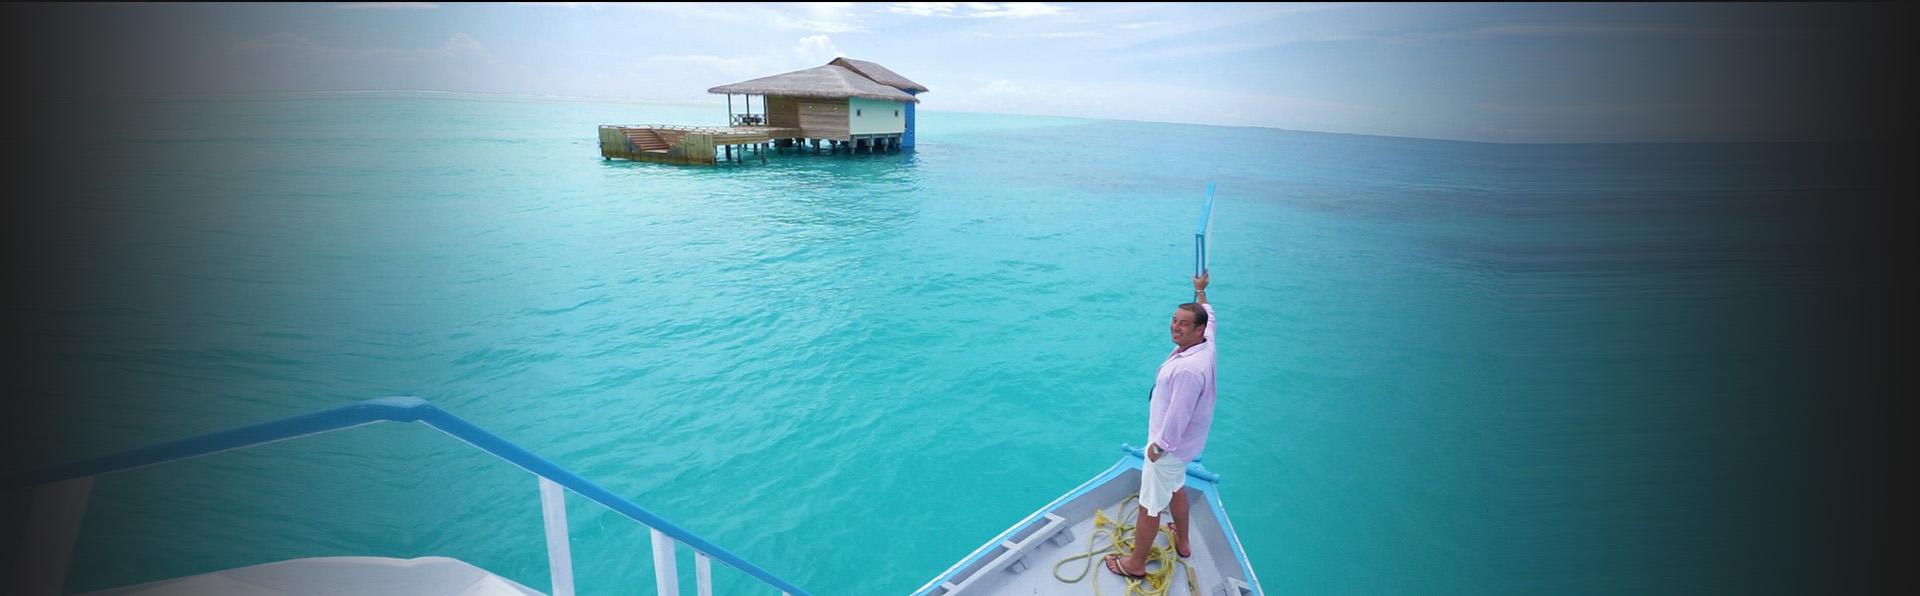 maldives travel by dart show